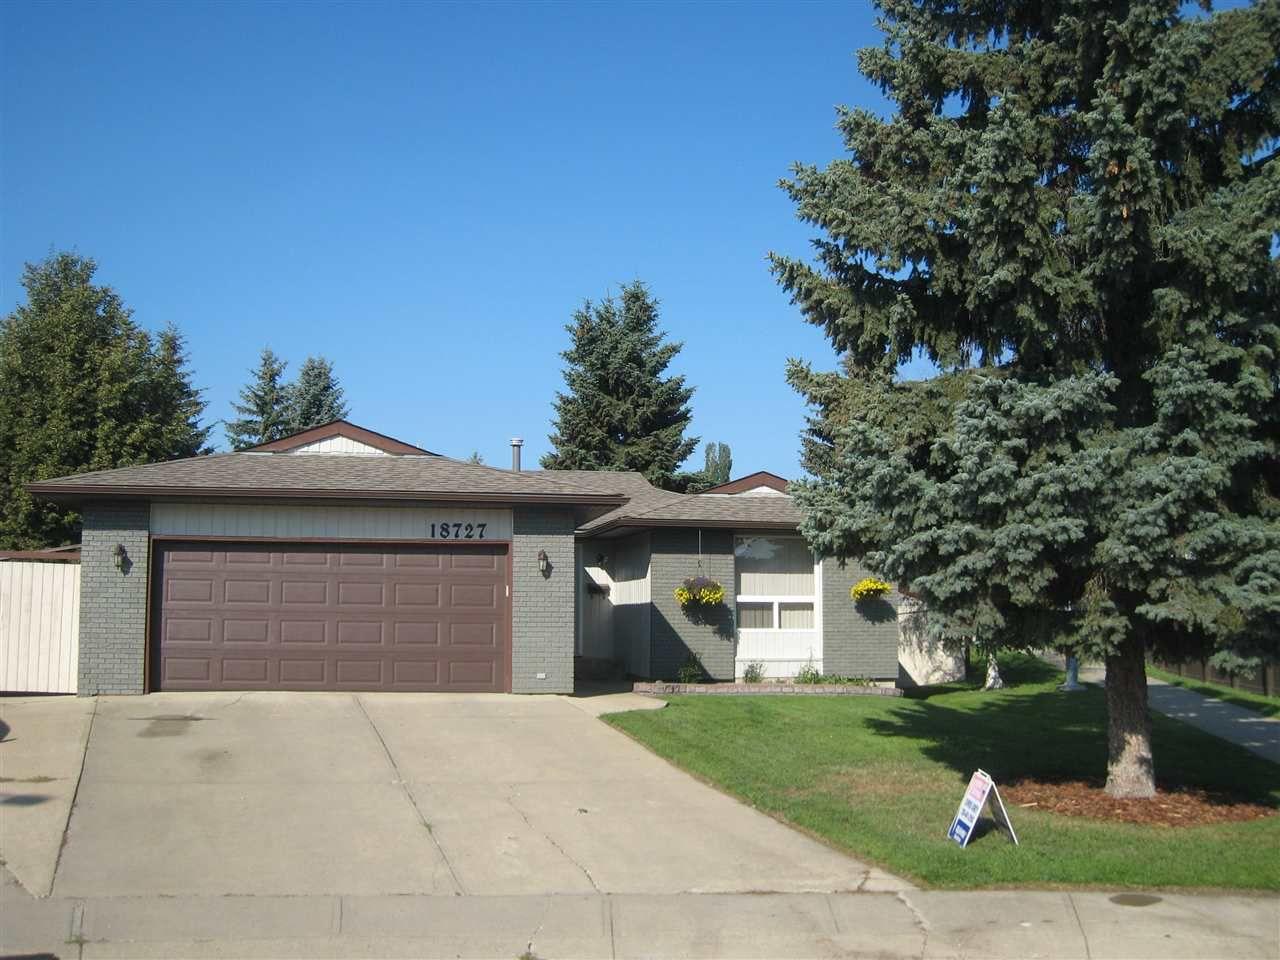 Main Photo: 18727 64 Avenue in Edmonton: Zone 20 House for sale : MLS®# E4133865